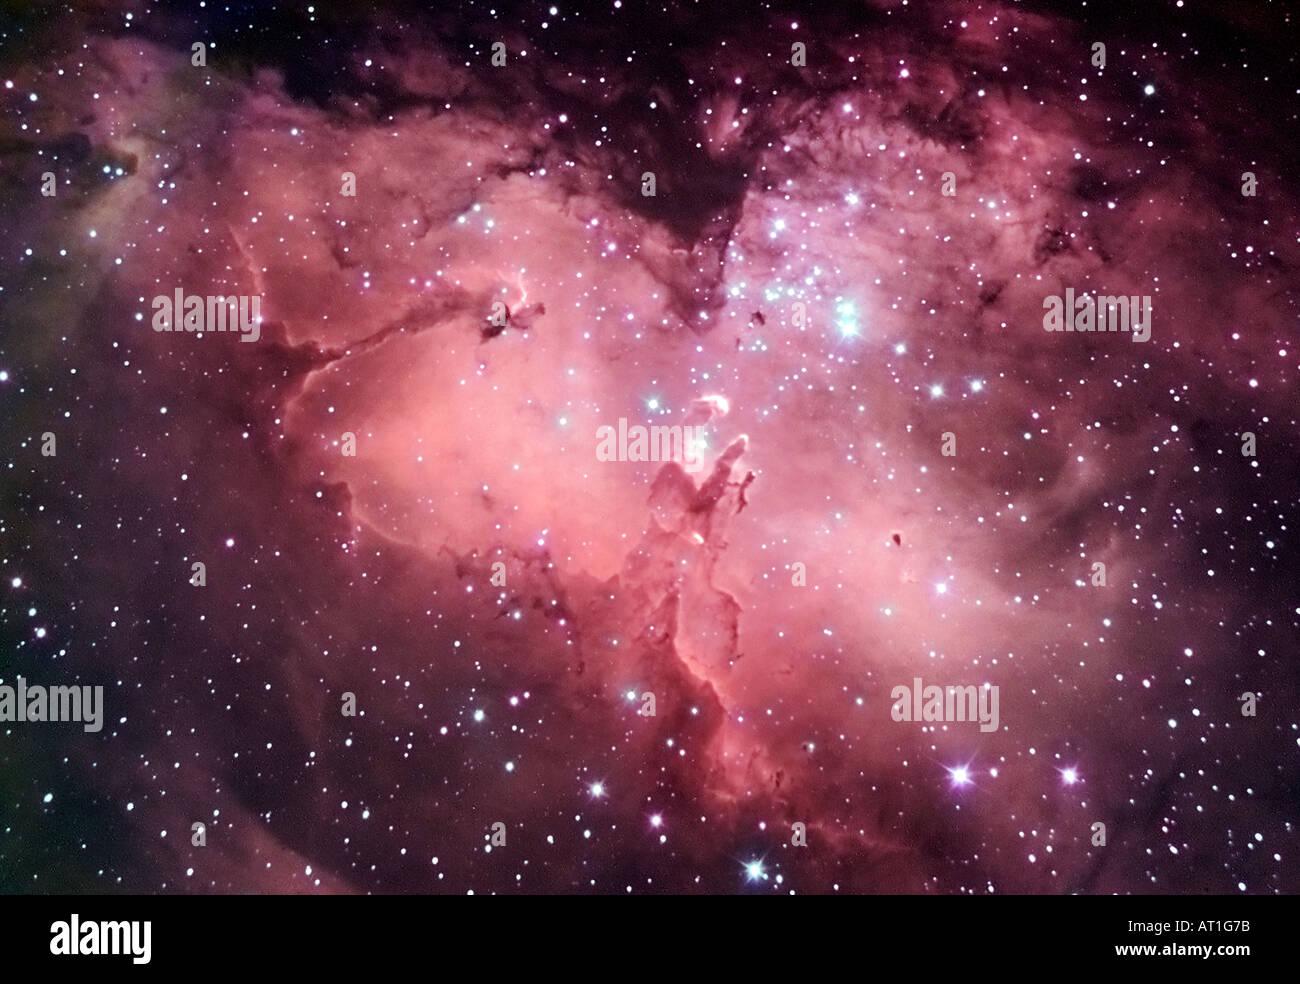 m16-eagle-nebula-in-snake-constellation-